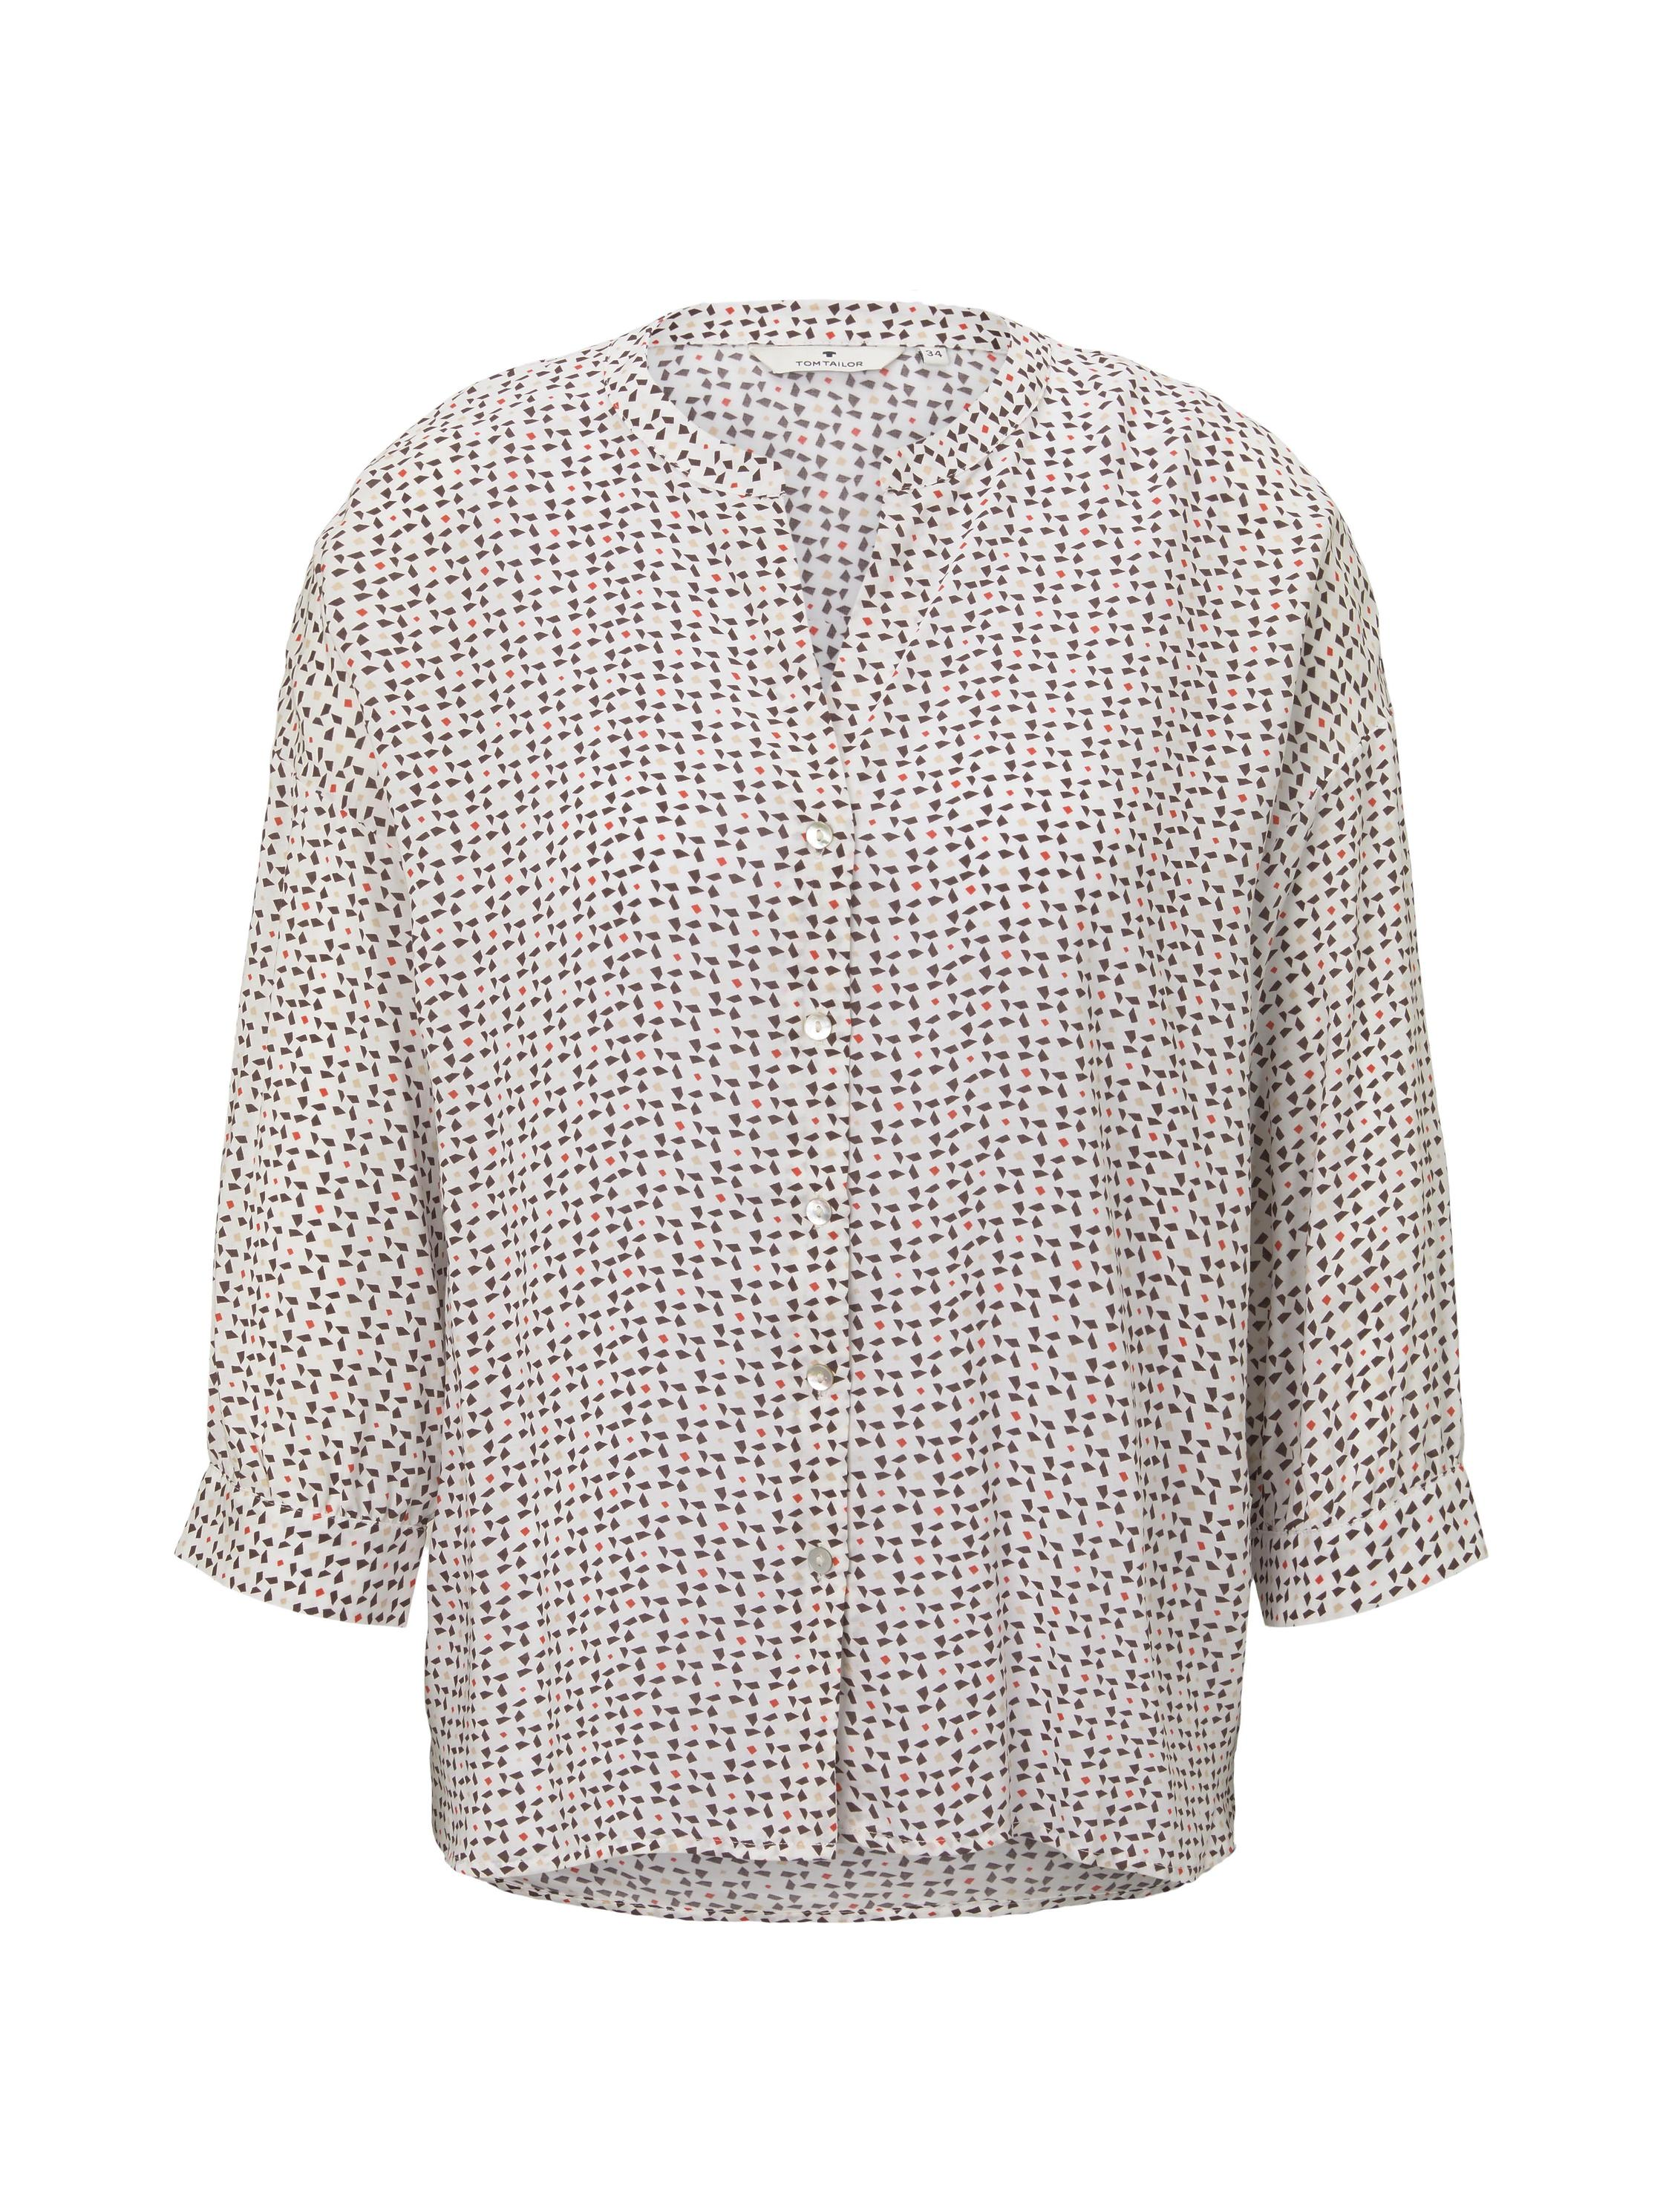 blouse printed loose shape, white geometric design